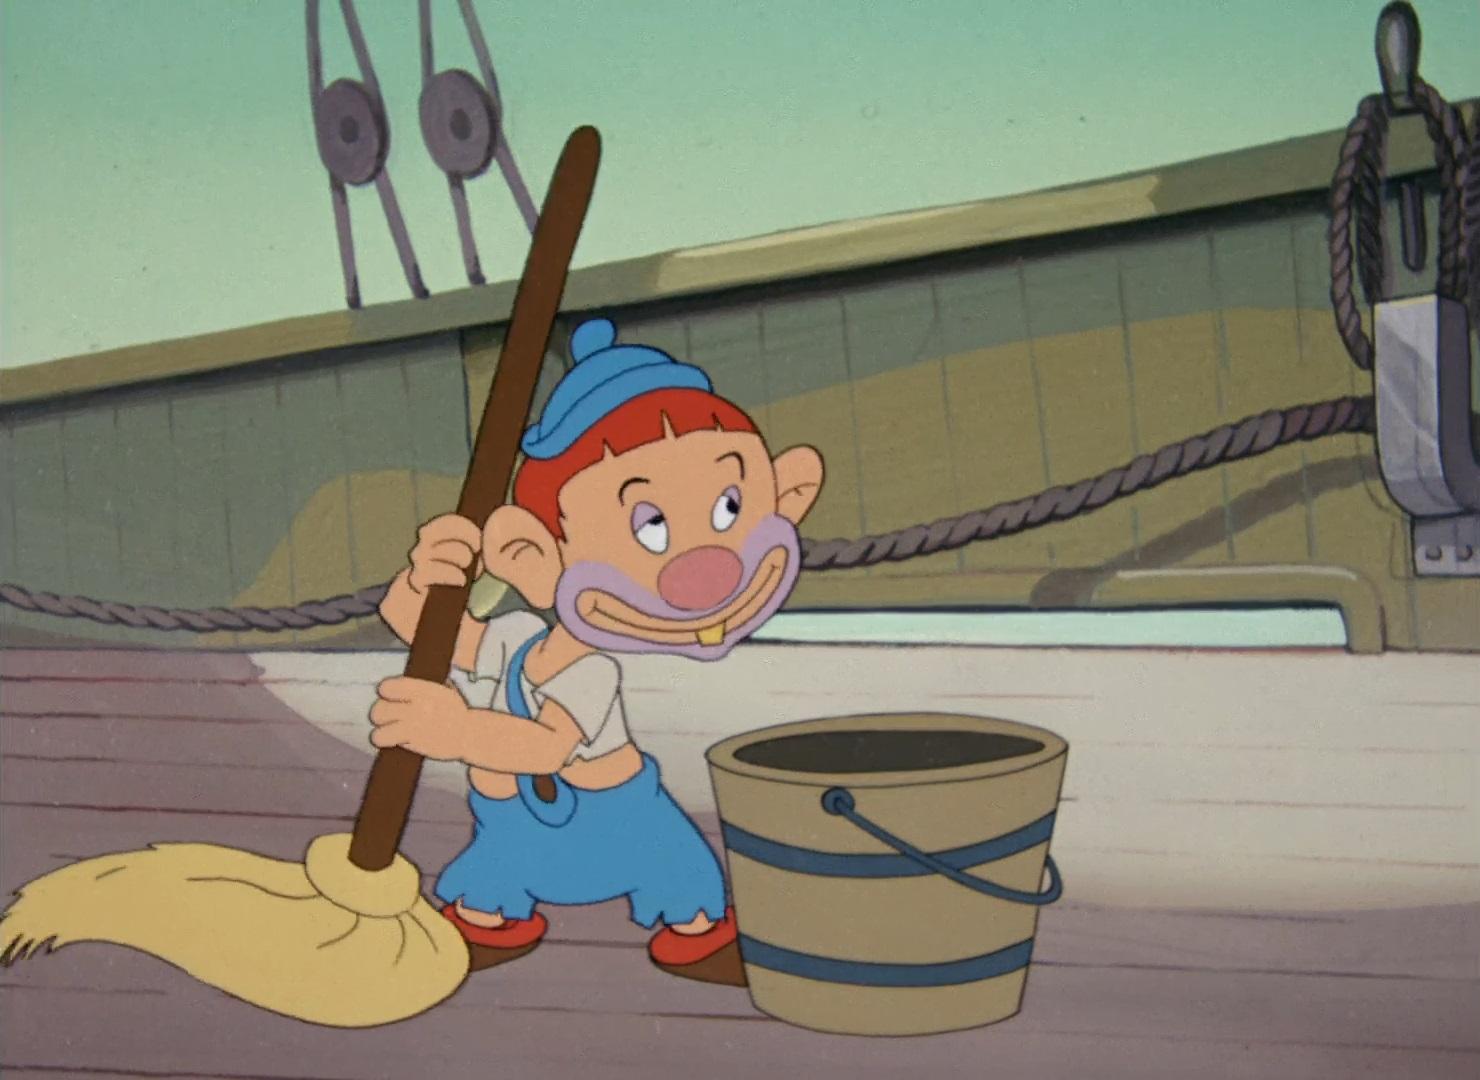 File:Popeye and pirates.jpg